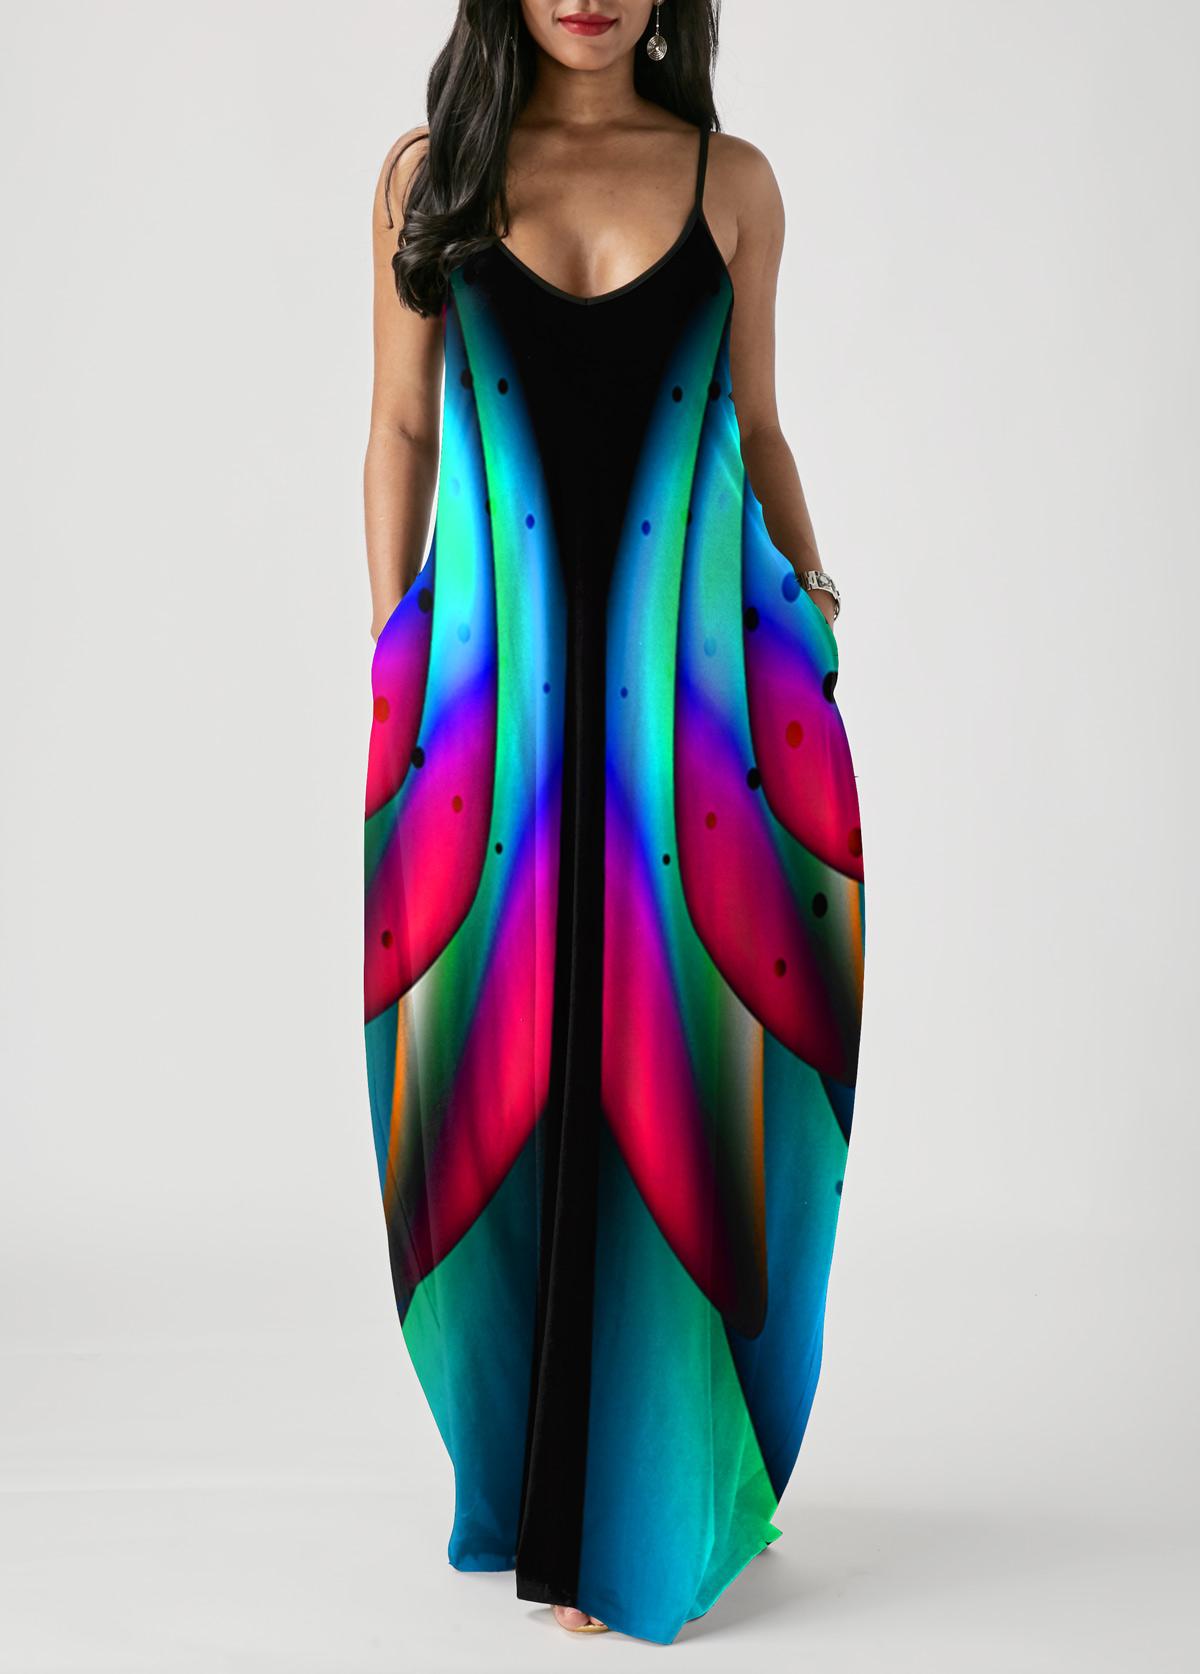 ROTITA Spaghetti Strap Colorful Printed Pocket Dress